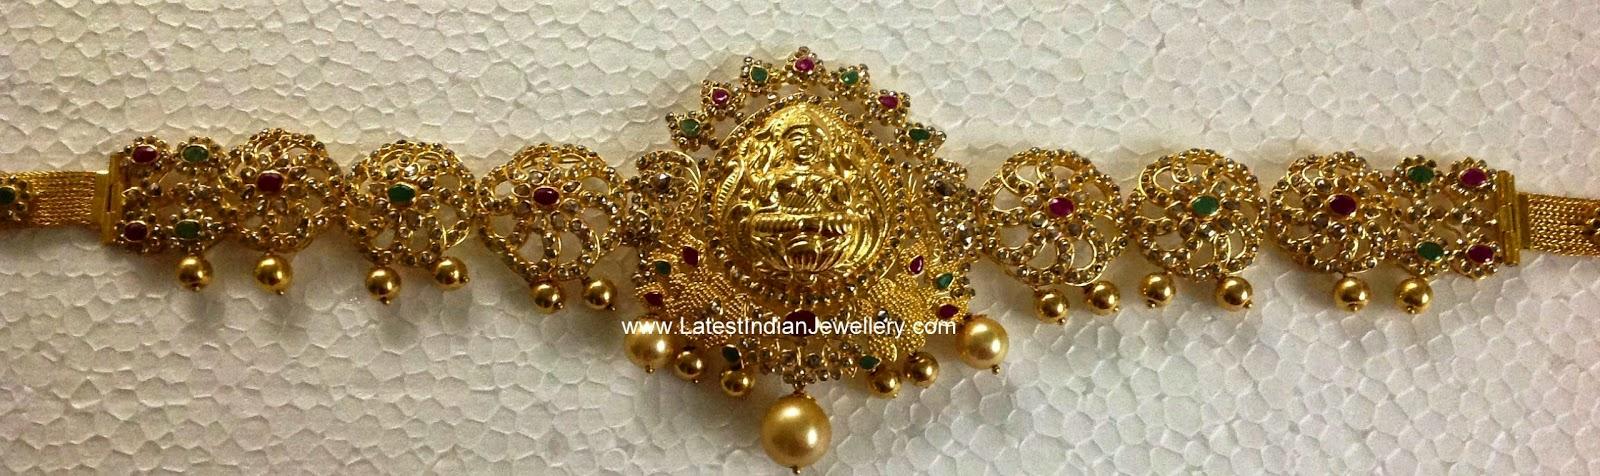 uncut diamond lakshmi design vaddanam